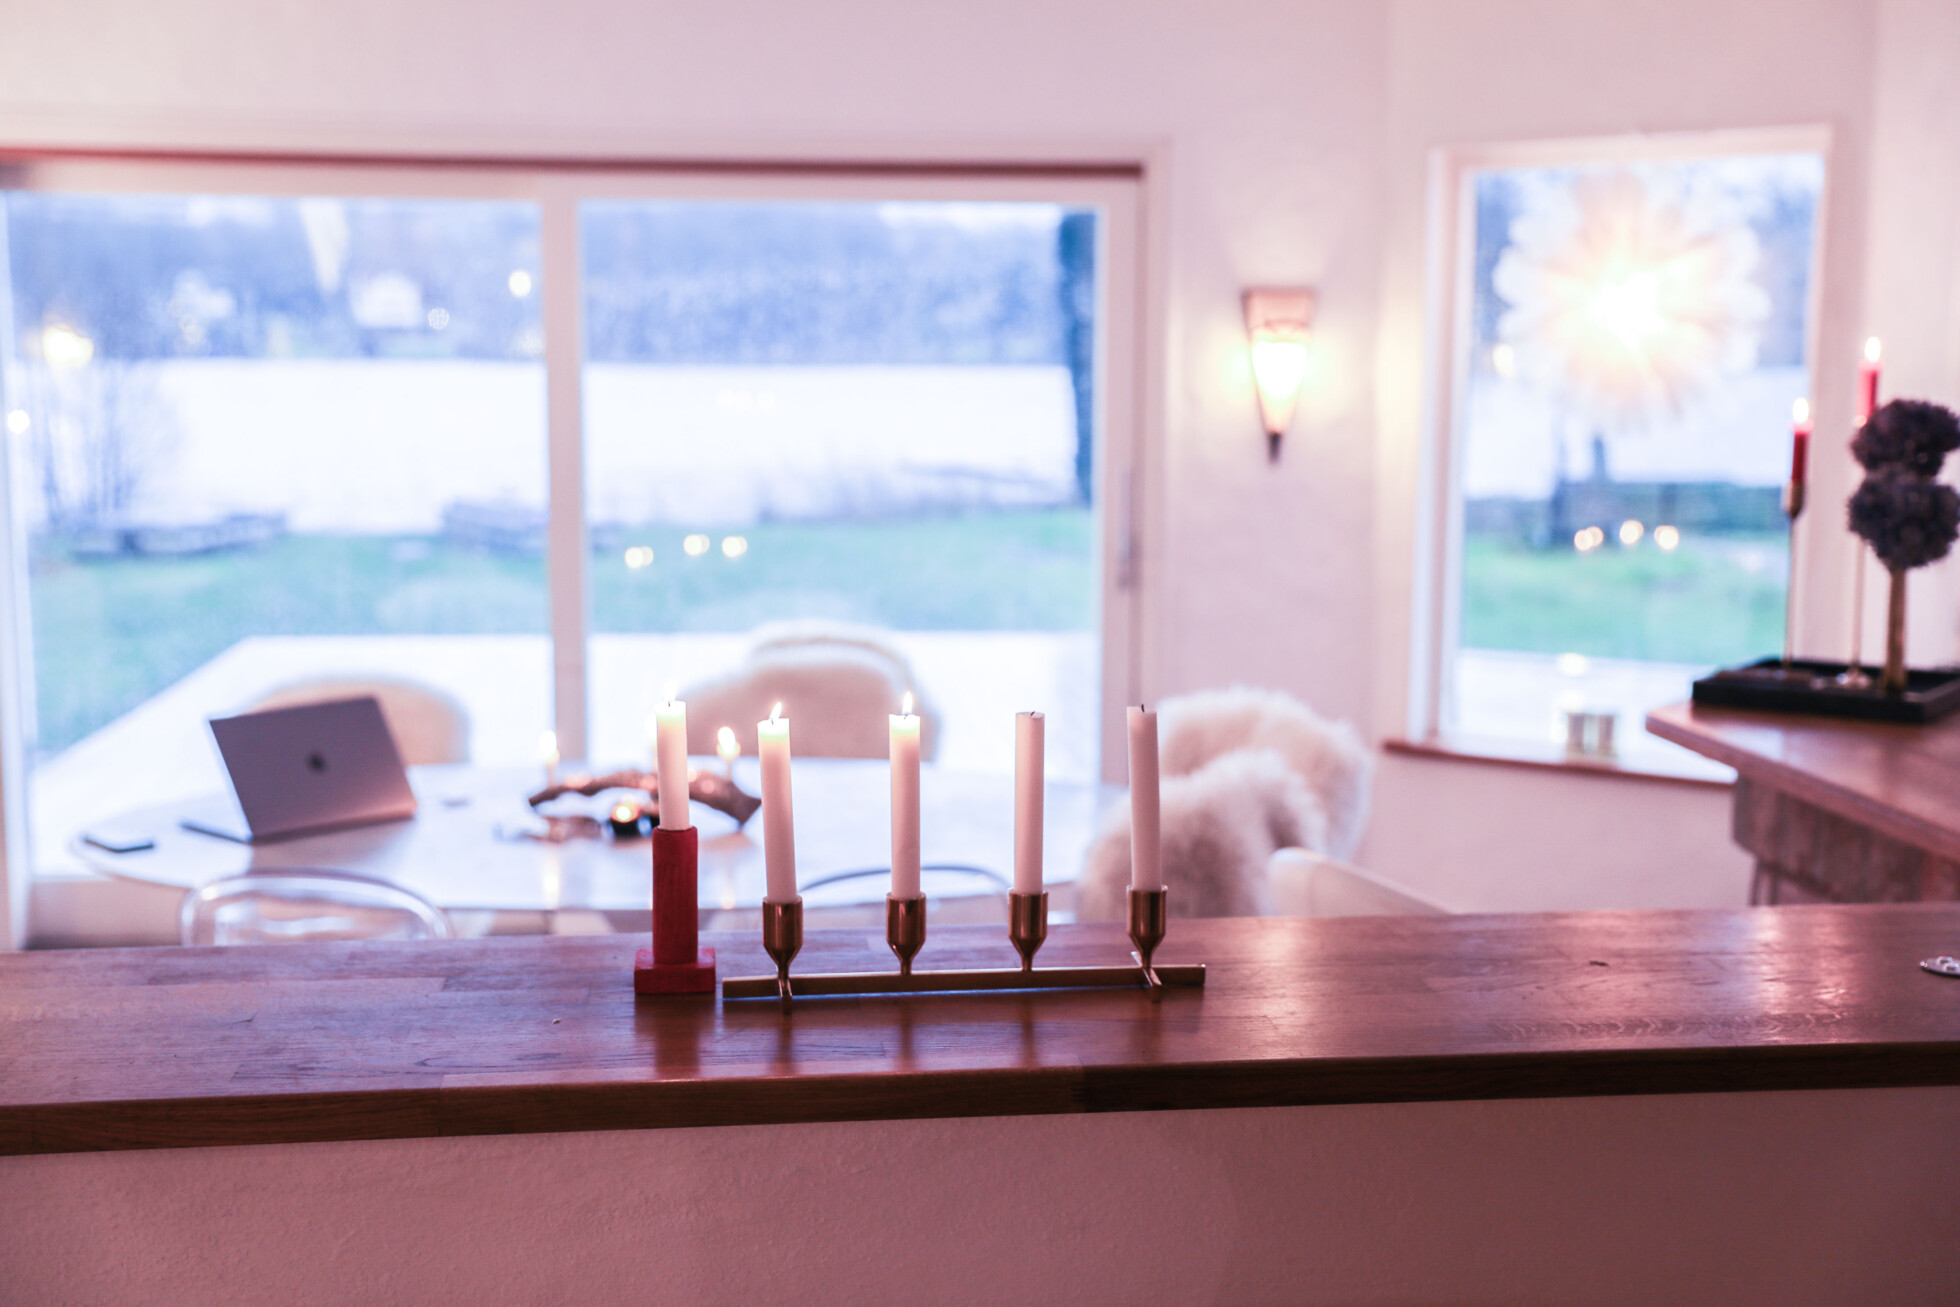 andra advent laila. Black Bedroom Furniture Sets. Home Design Ideas